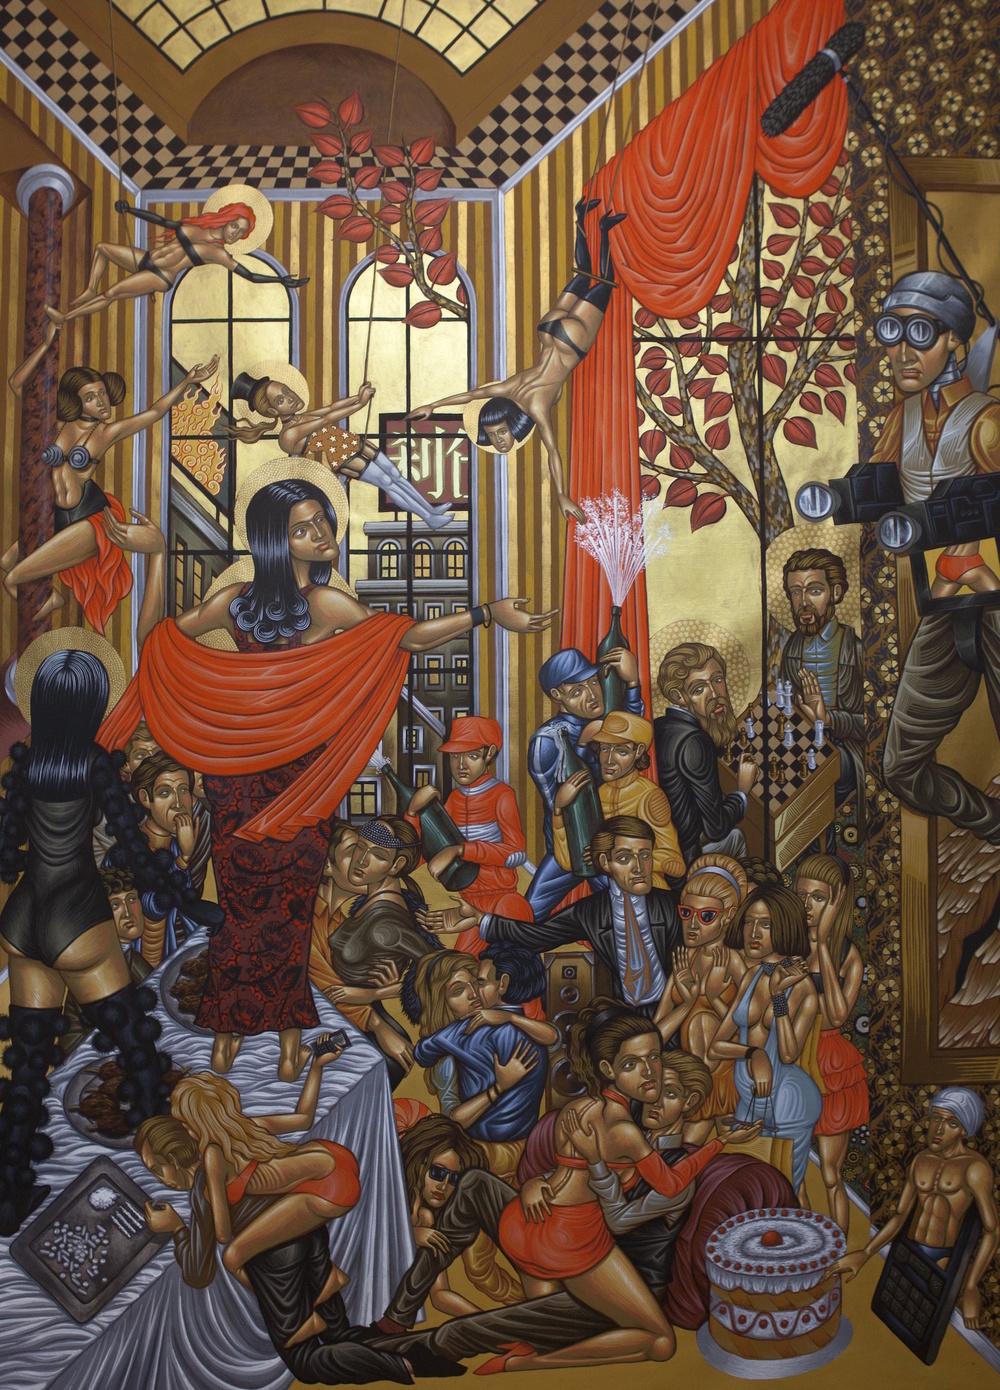 Stelios Faitakis_Untitled_2012_mixed media on canvas_260x190cm_Courtesy The Breeder Athens copy.jpg